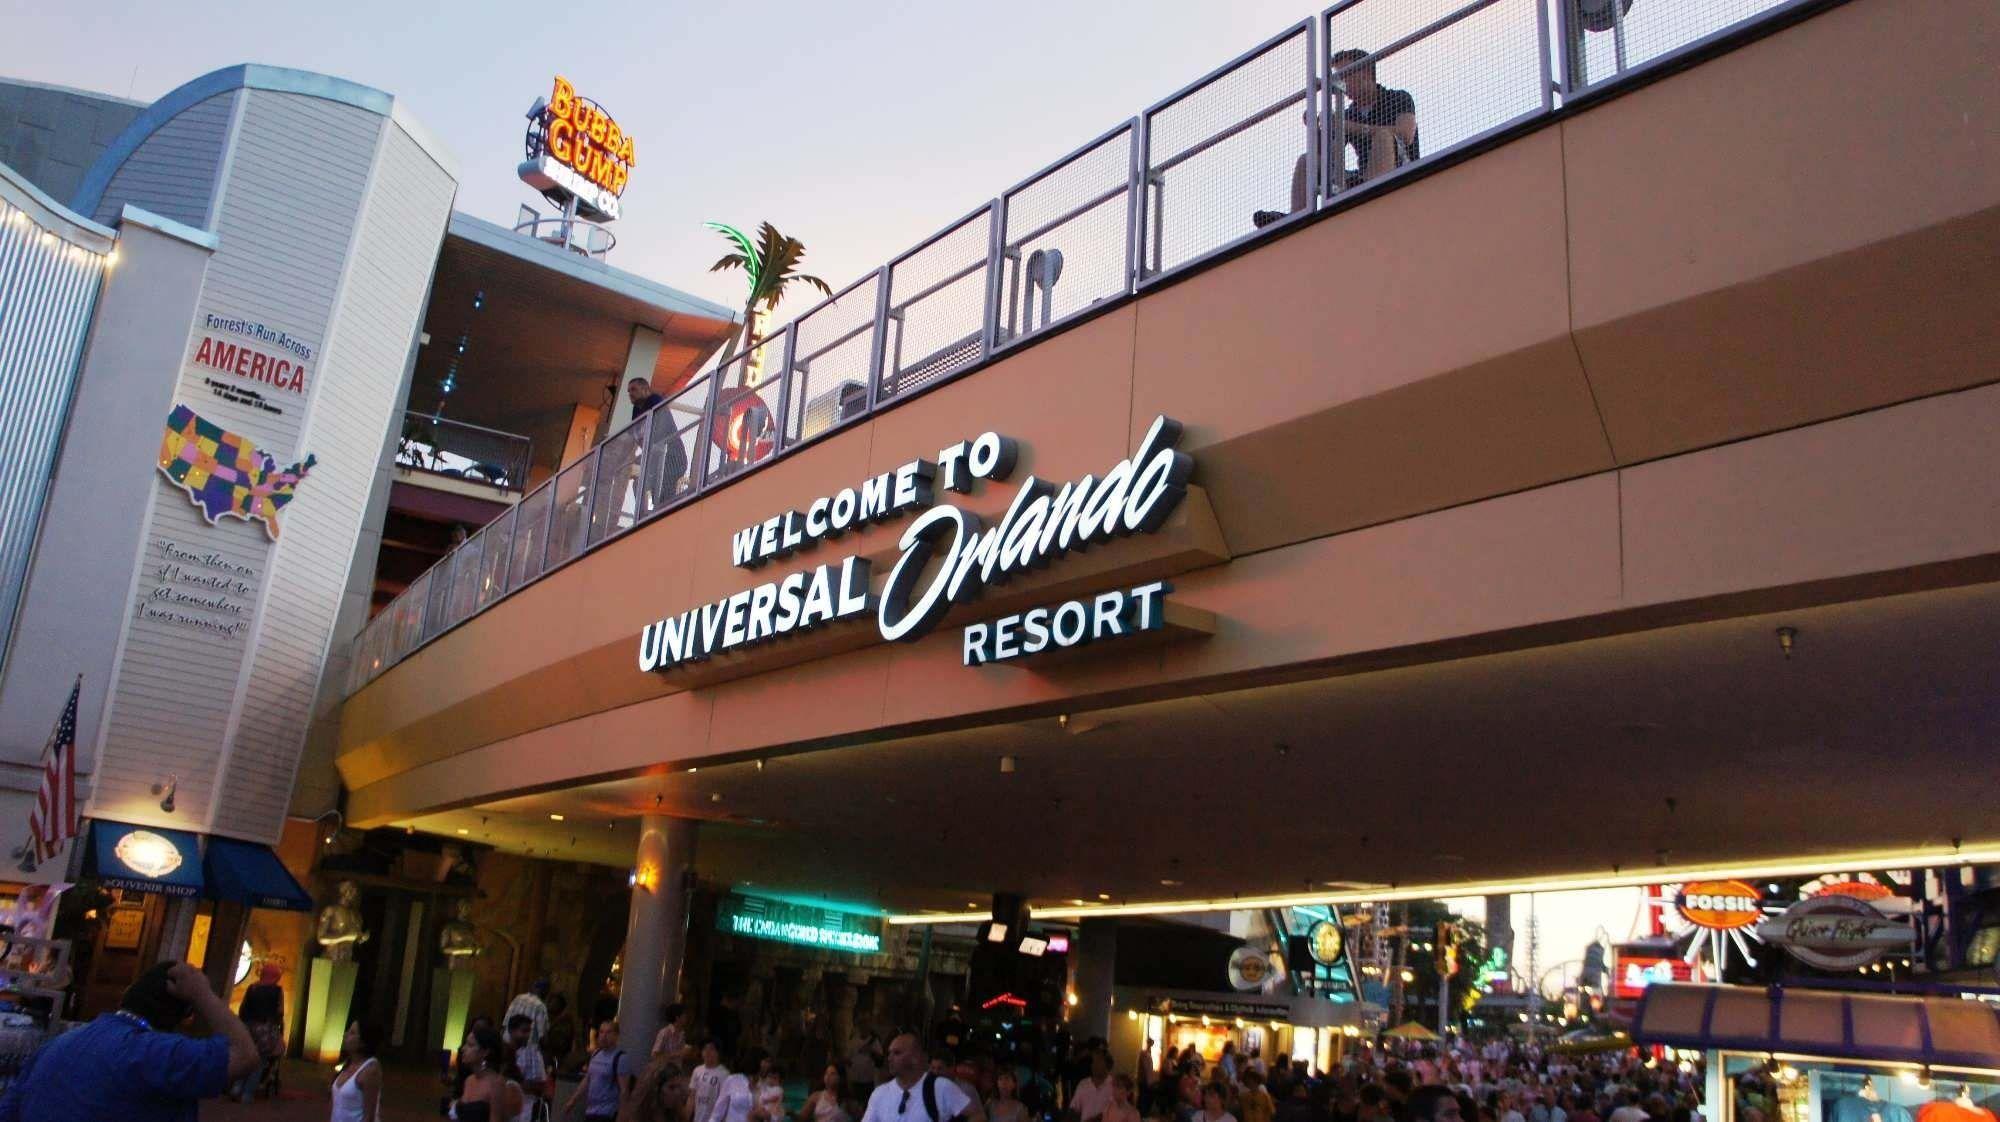 Breakfast Options At Universal Citywalk Orlando Orlando Informer Universal Studios Orlando Universal Studios Florida Universal Hotels